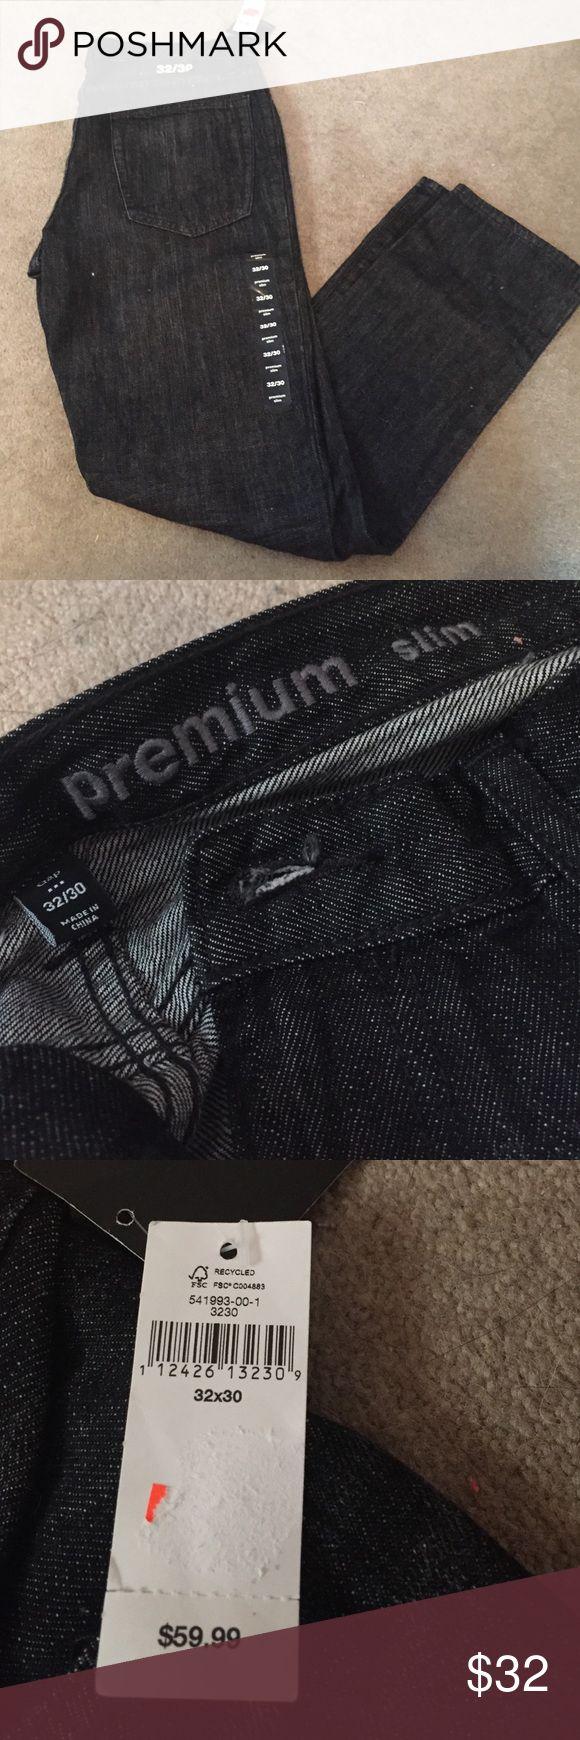 Gap MENS slim jeans - 32x30 Gap men's premium slim dark wash jeans (Dark blue, not black). Size 32x30 and never been worn. GAP Jeans Slim